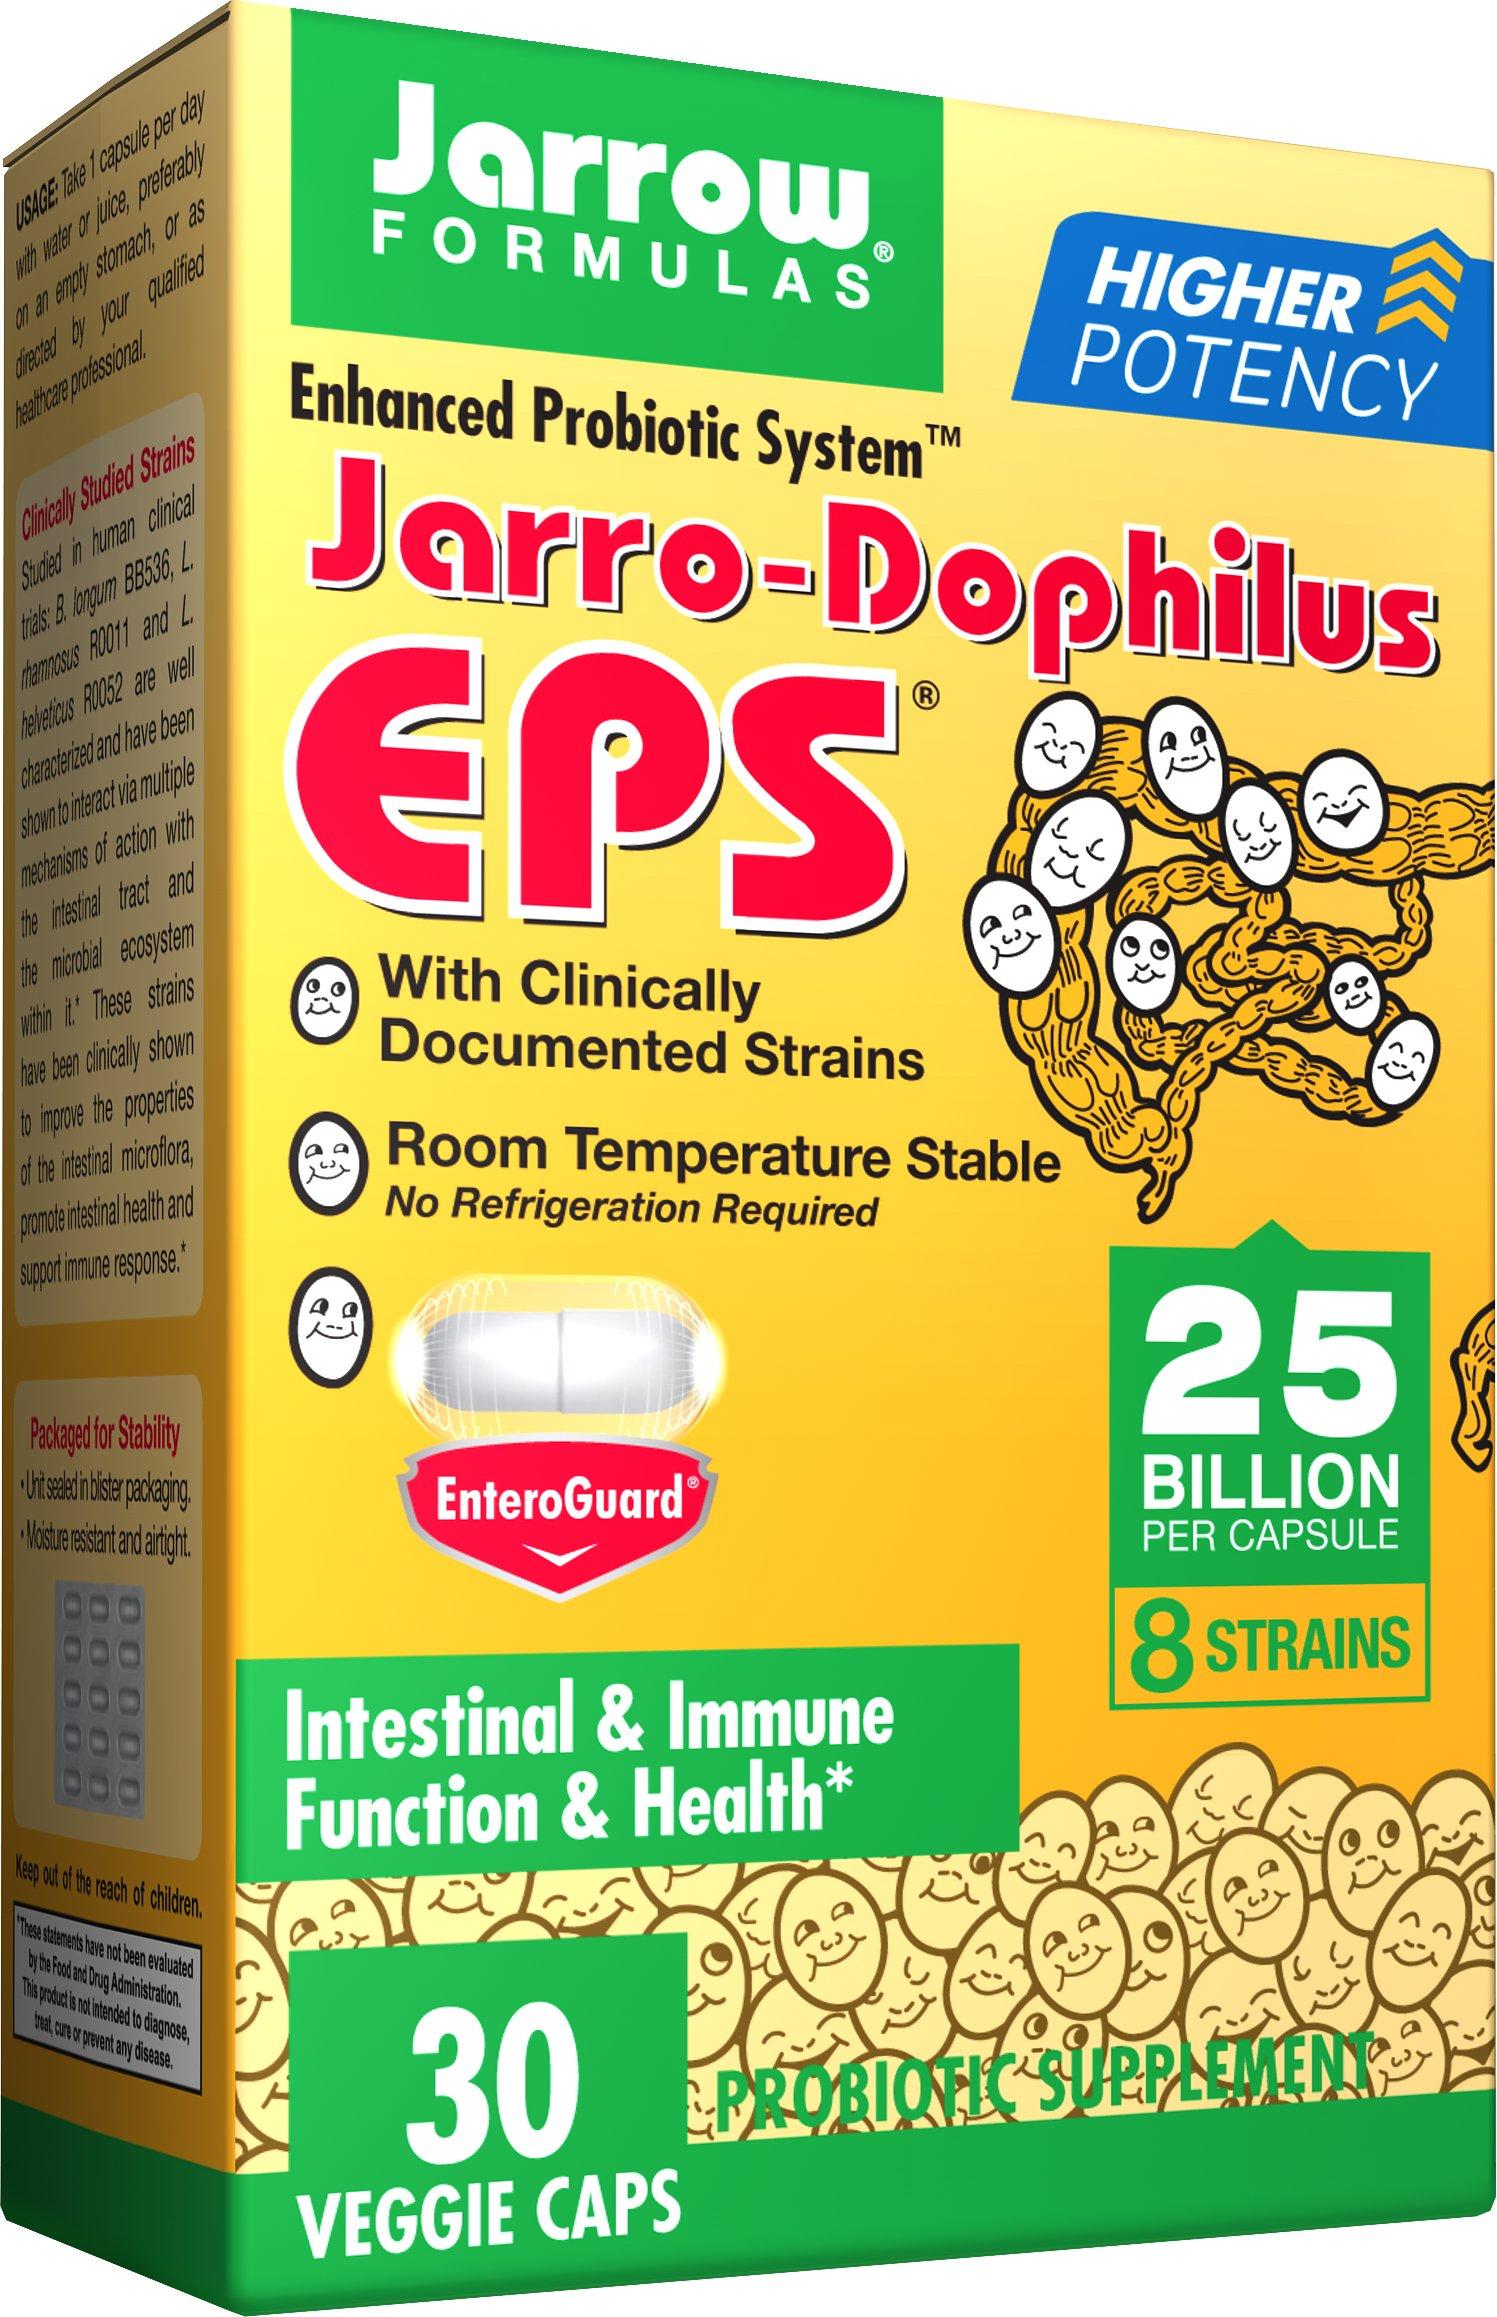 Jarrow Formulas Jarro-Dophilus EPS, Supports Intestinal Health,  25 Billion Per Capsule, Supports Gastrointestinal Health, 30 Caps (Cool Ship, Pack Of 2)